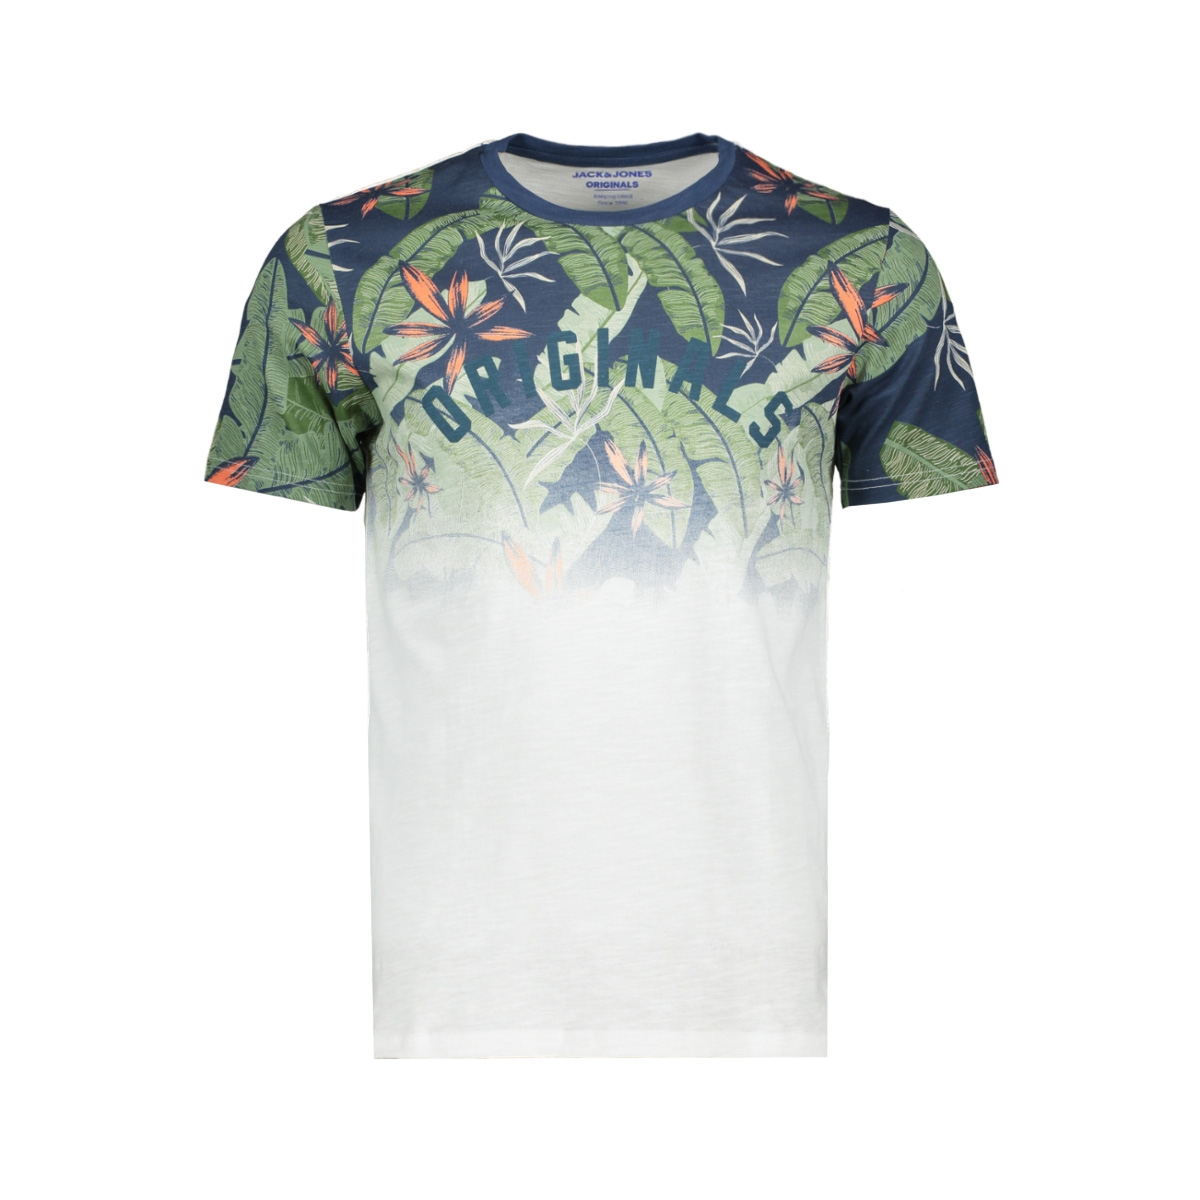 jornewolympia tee ss crew neck 12160833 jack & jones t-shirt white/slim